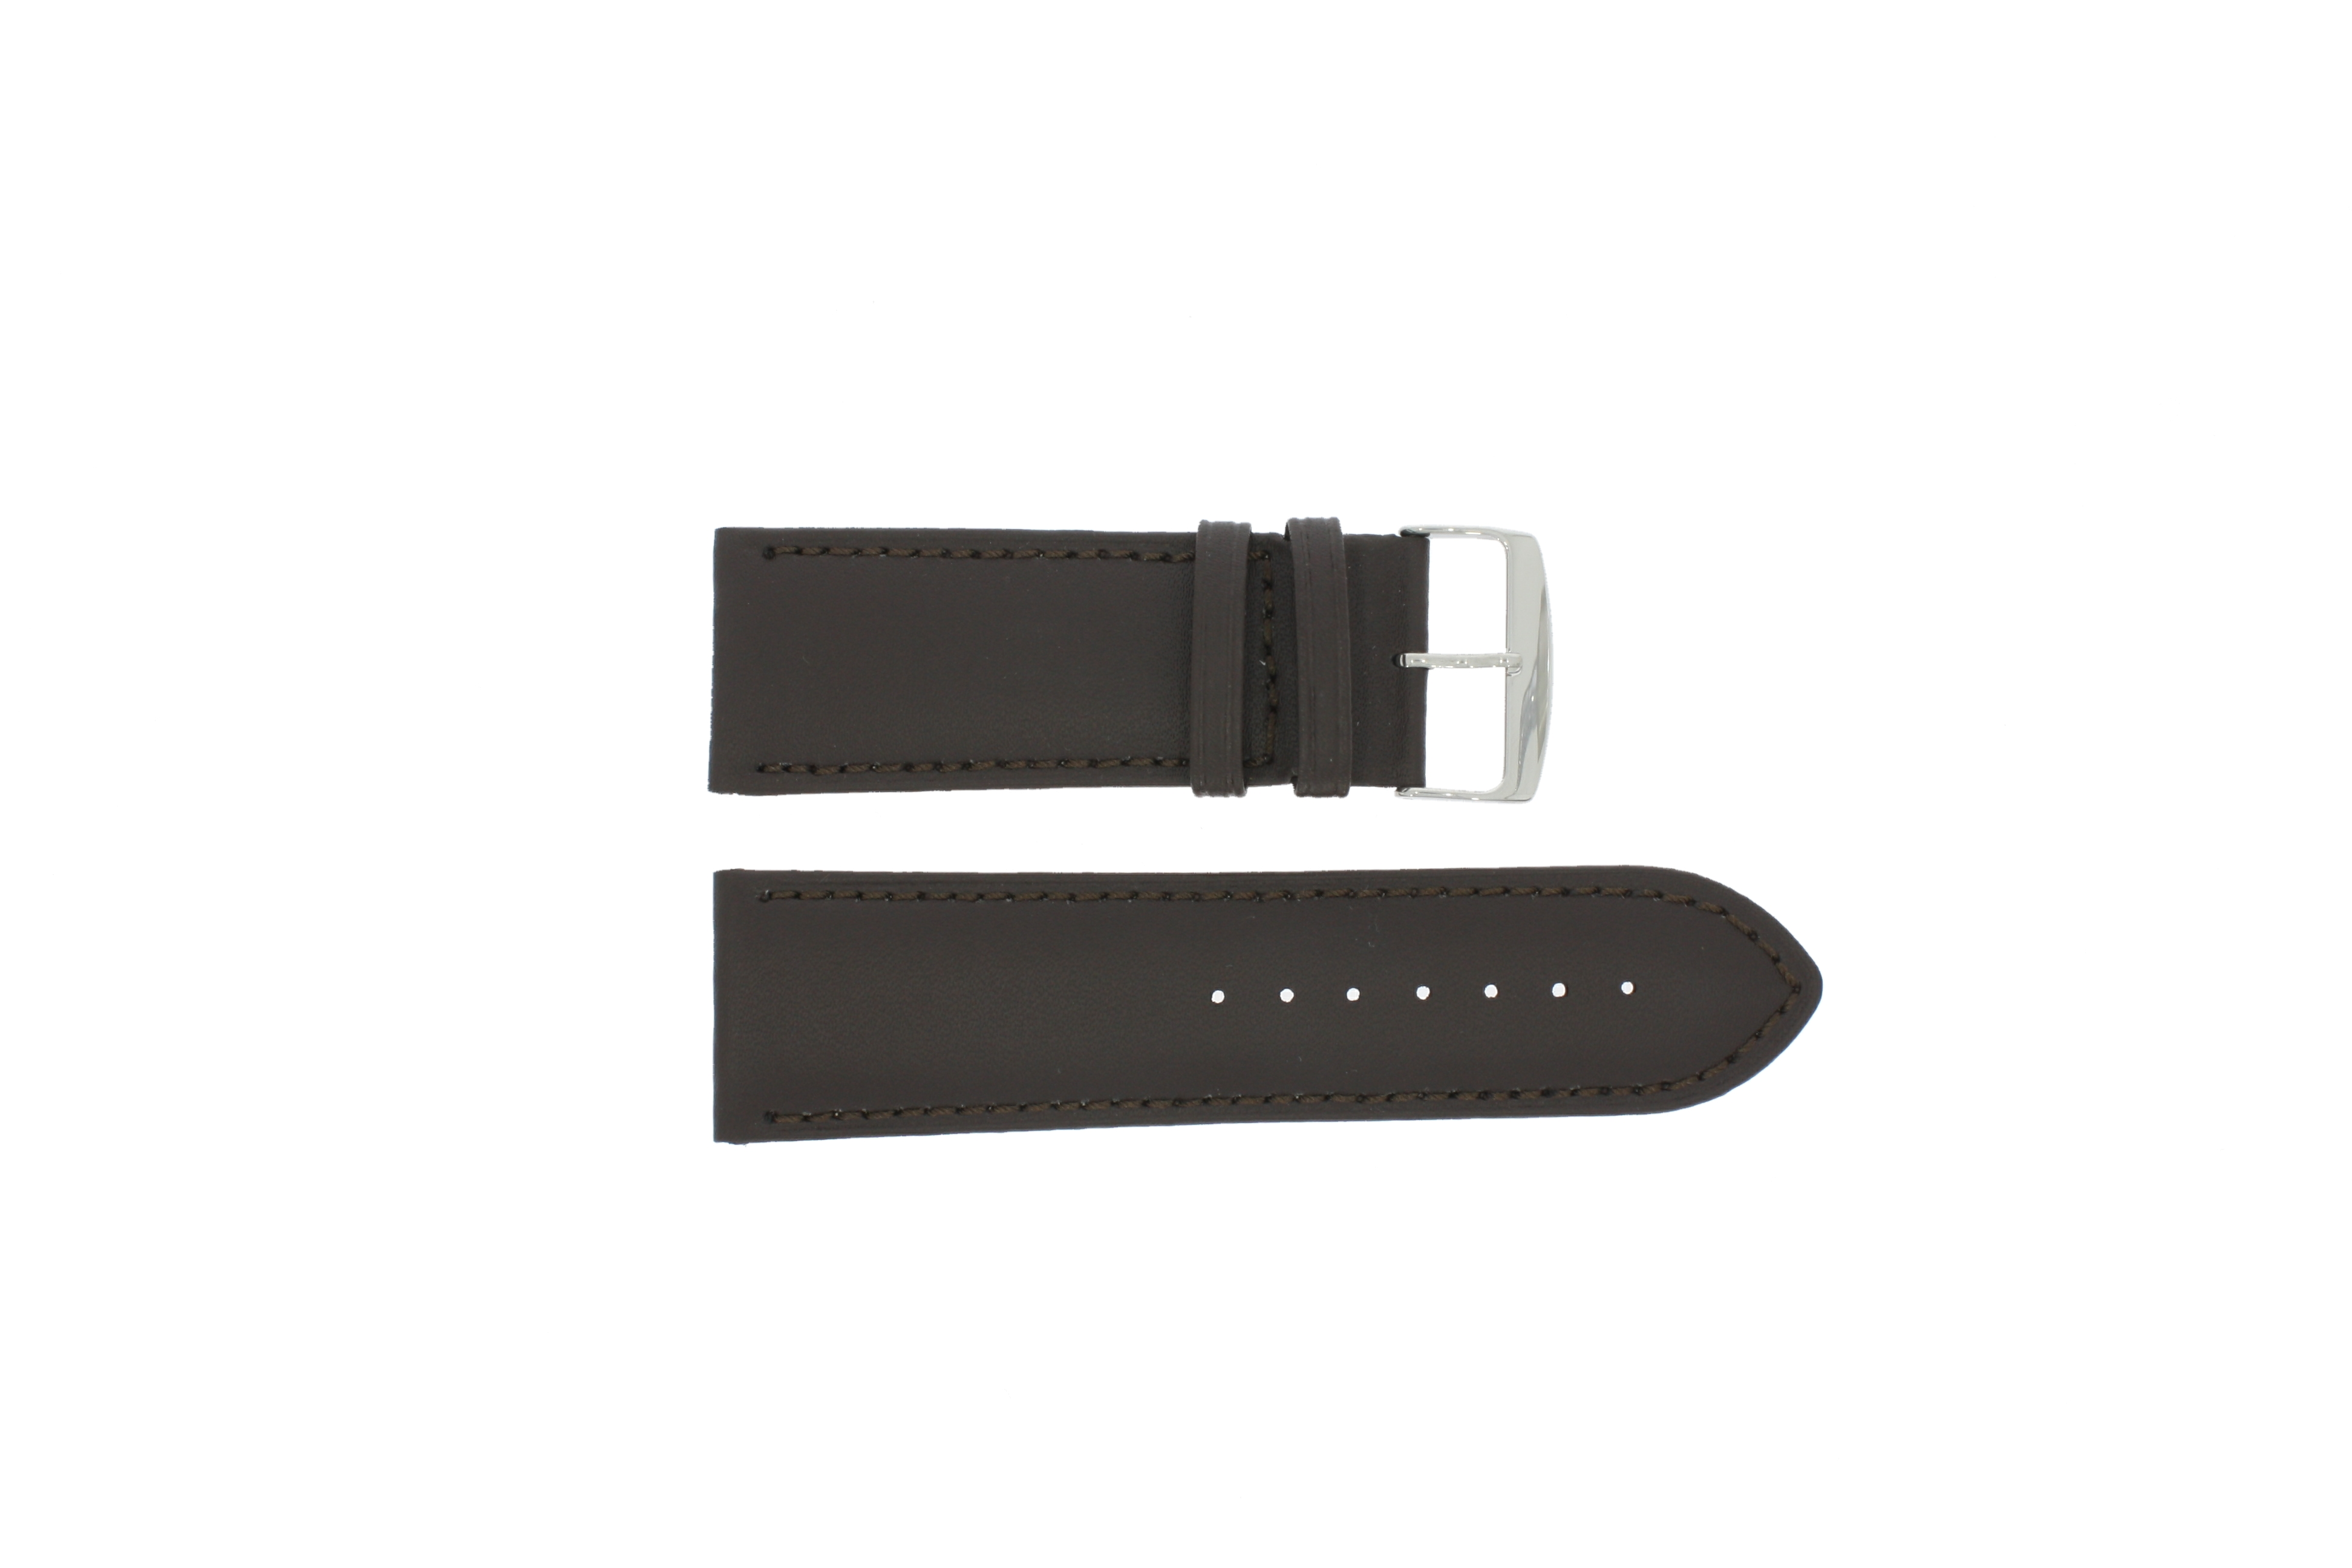 Horlogeband 306.02 Leder Bruin 32mm + standaard stiksel